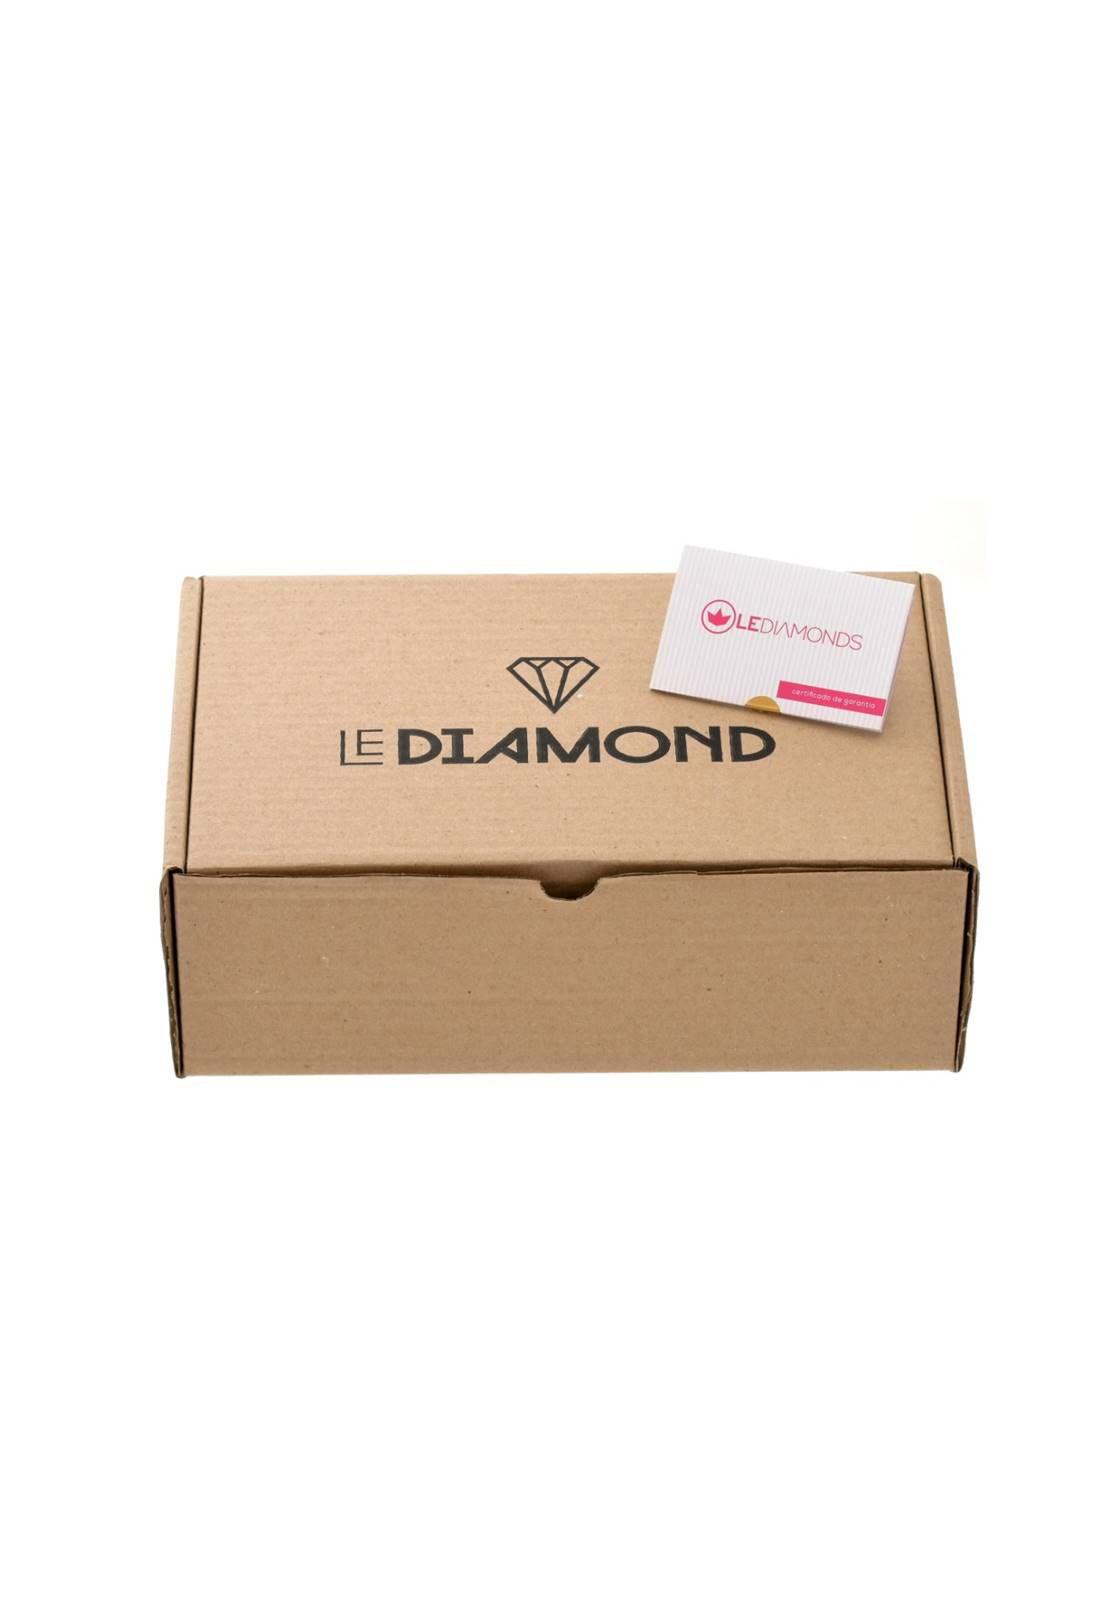 Brinco Le Diamond Geométrico Acrílico e Bola de Resina